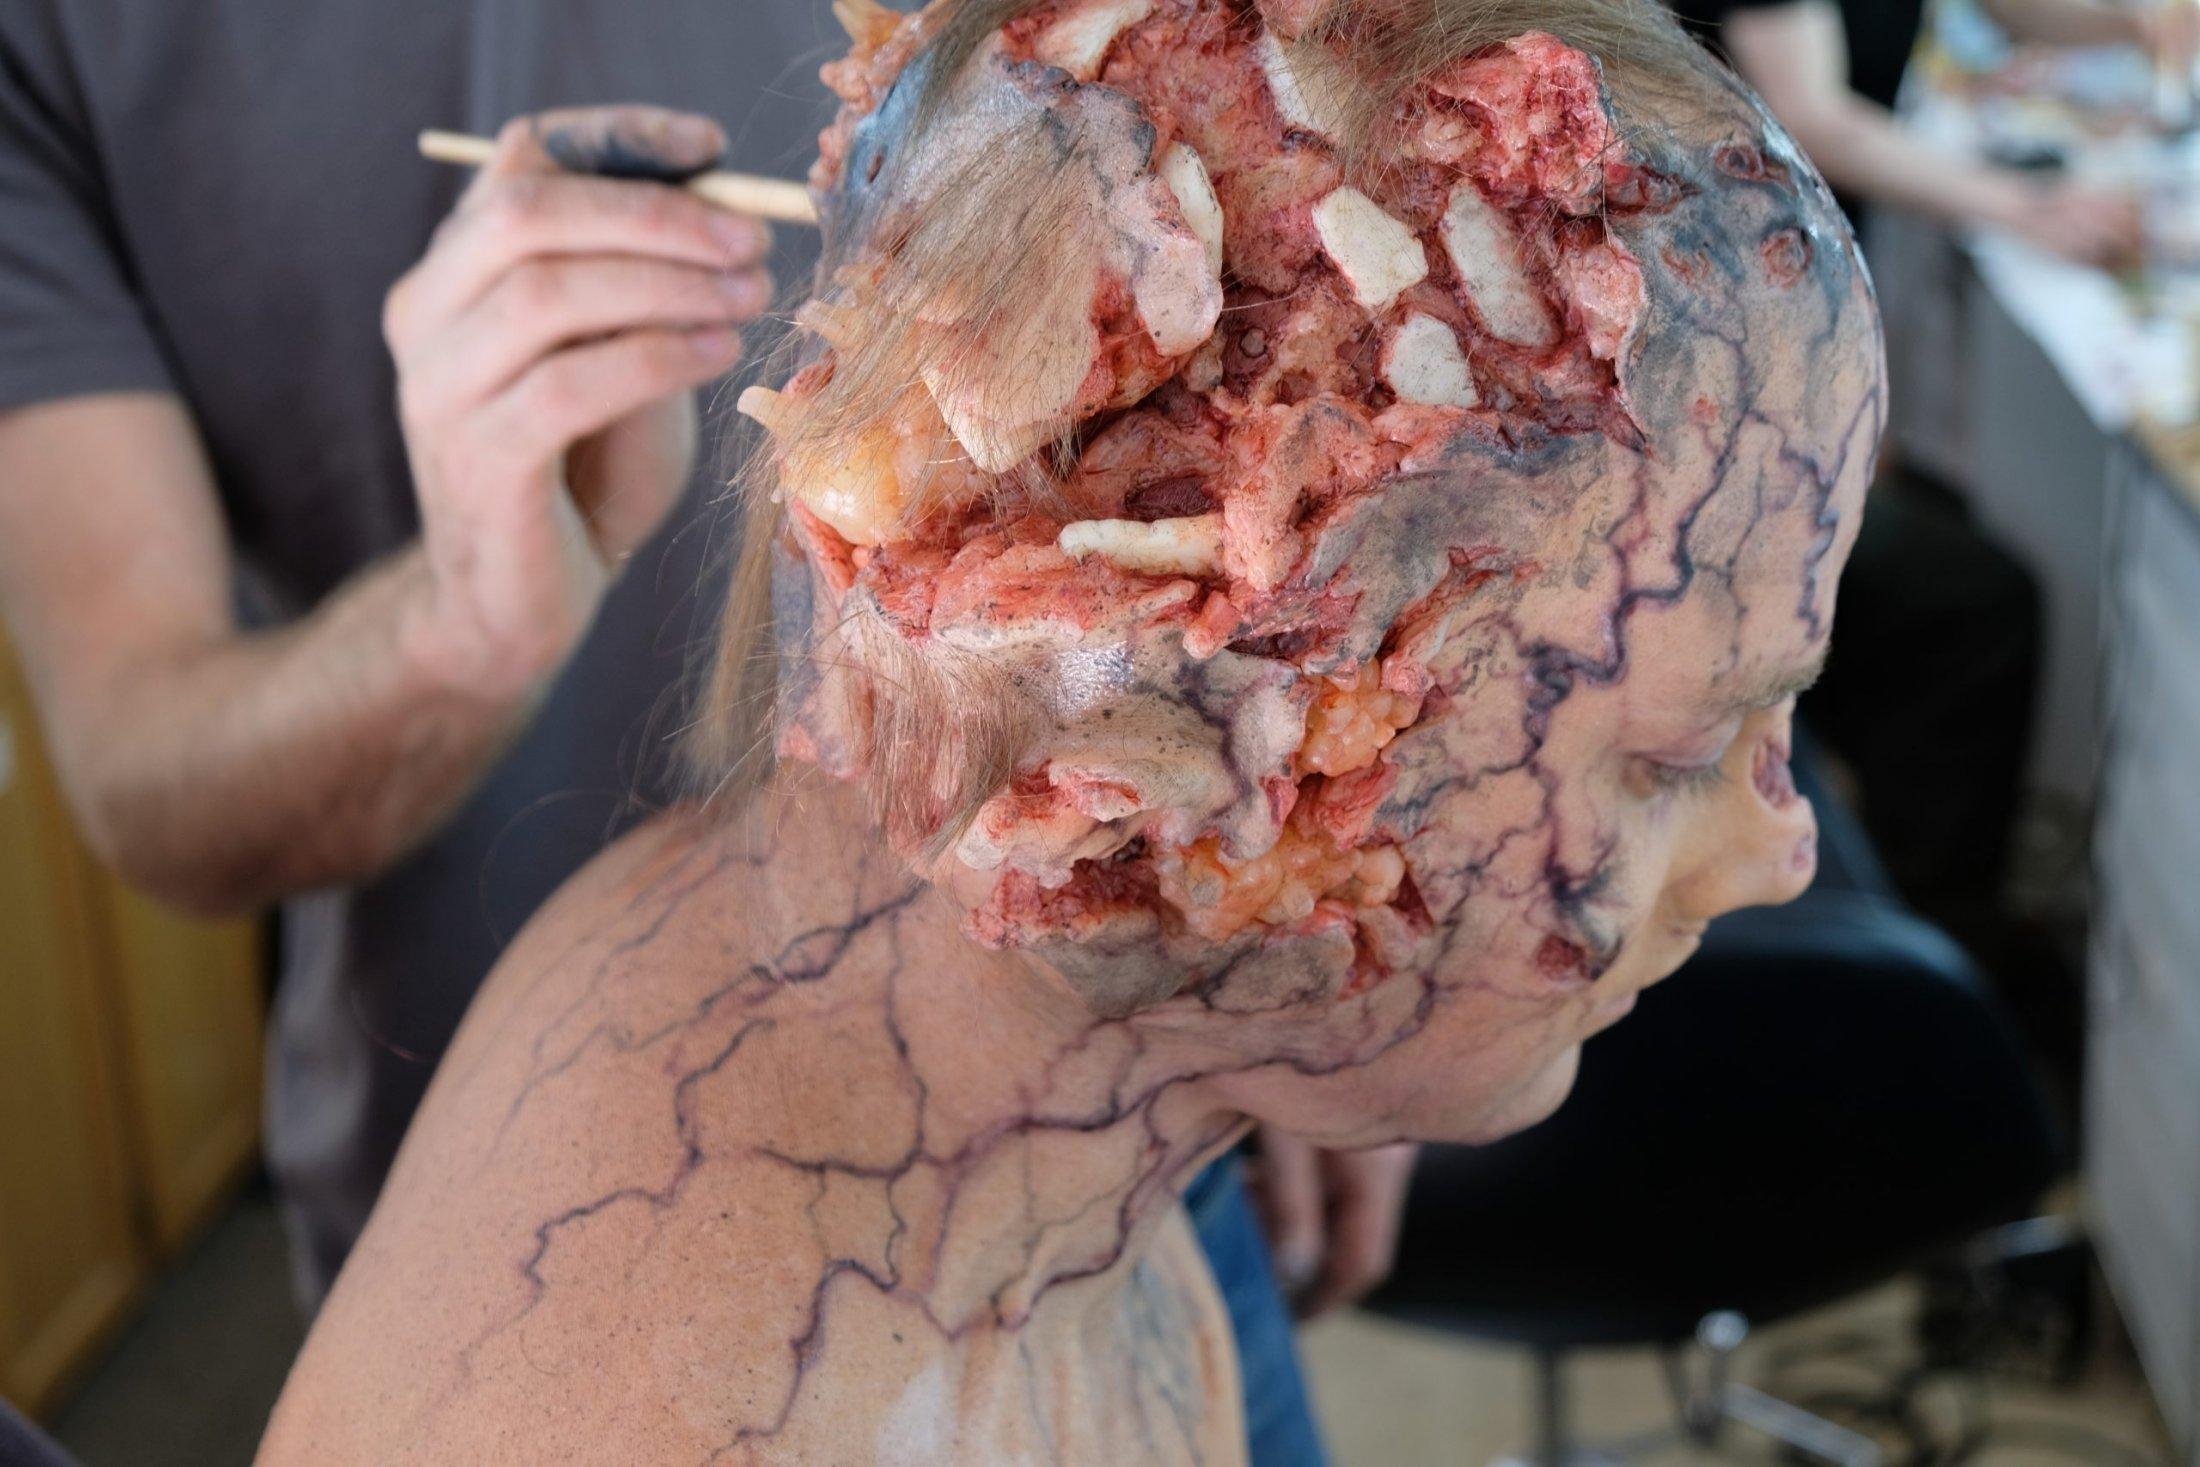 Makeup Application with Raquel Munuera Sànchez and Tristan Versluis